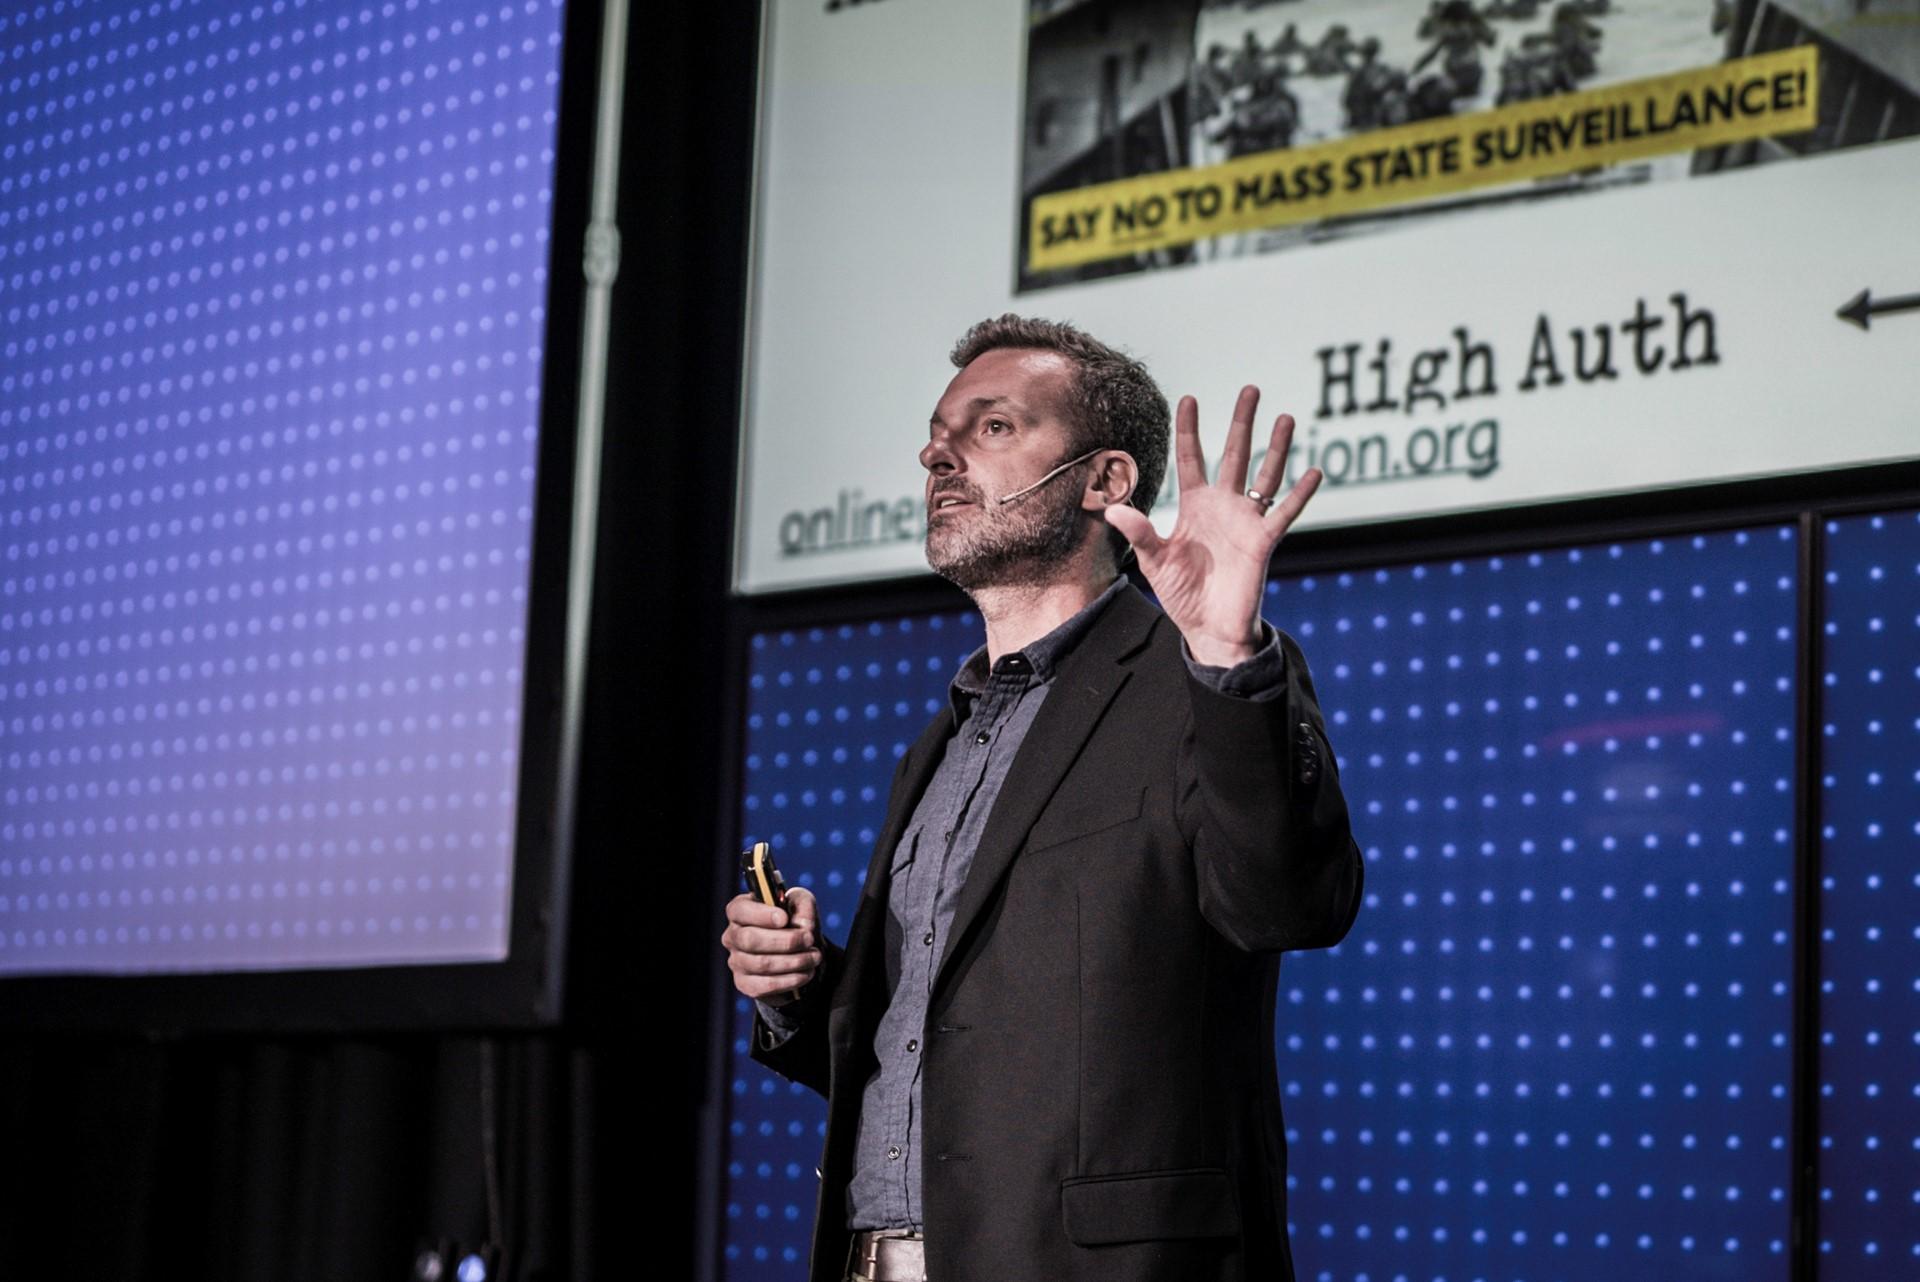 Professor David Carroll shared his Dark Data Quest at mcb tech